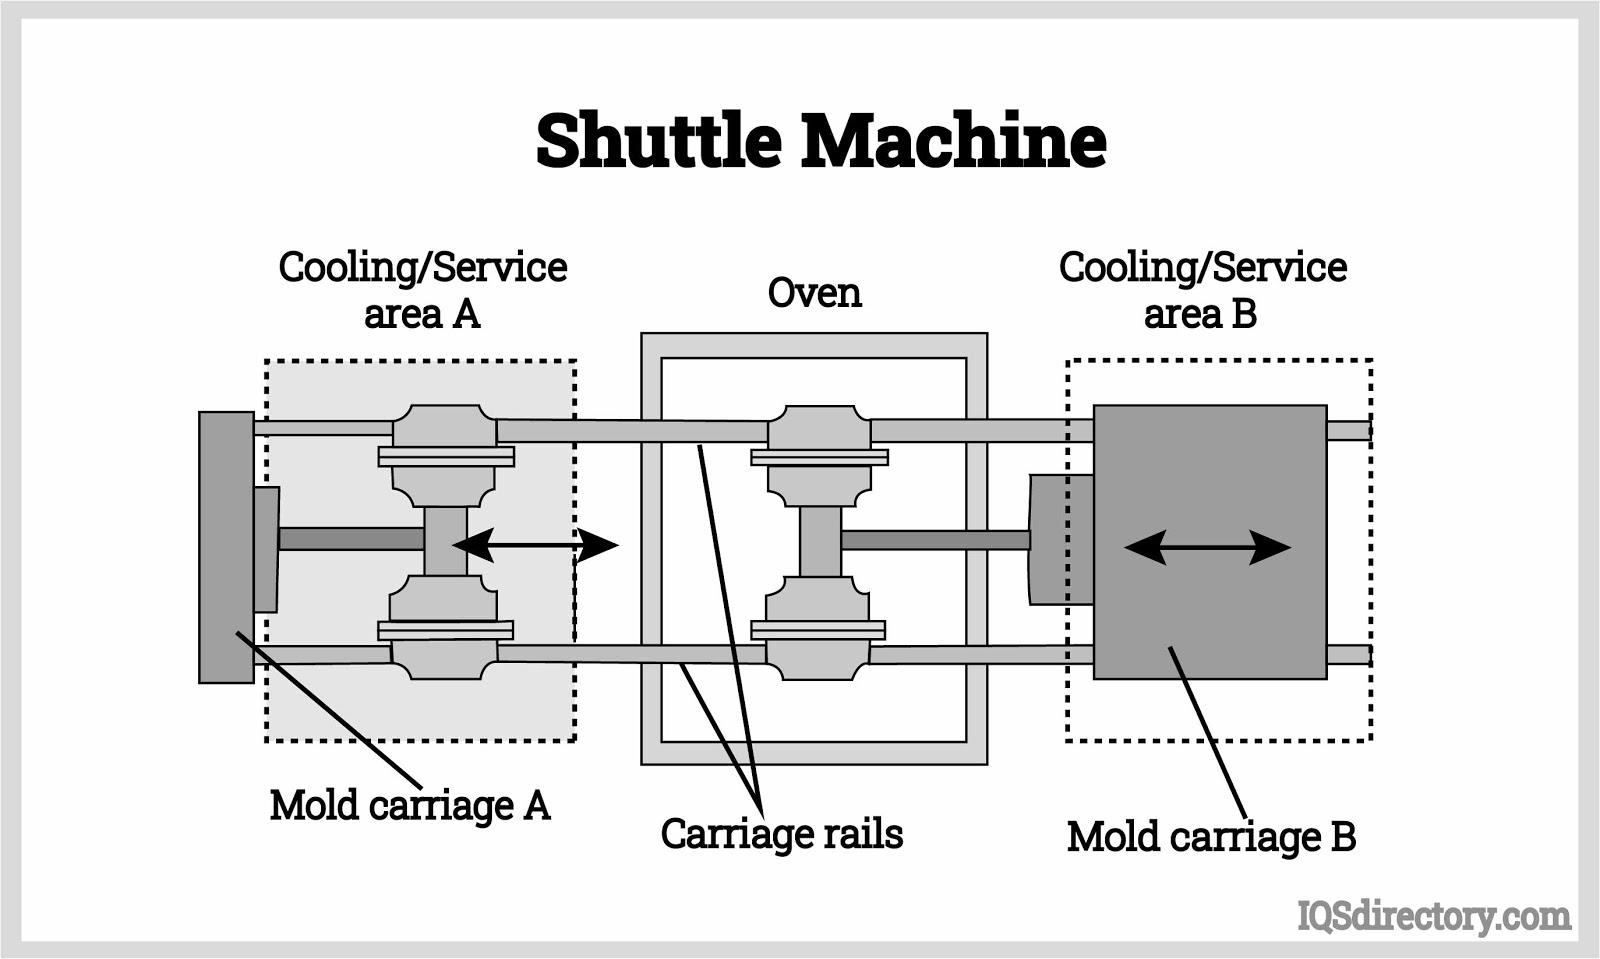 Shuttle Machine